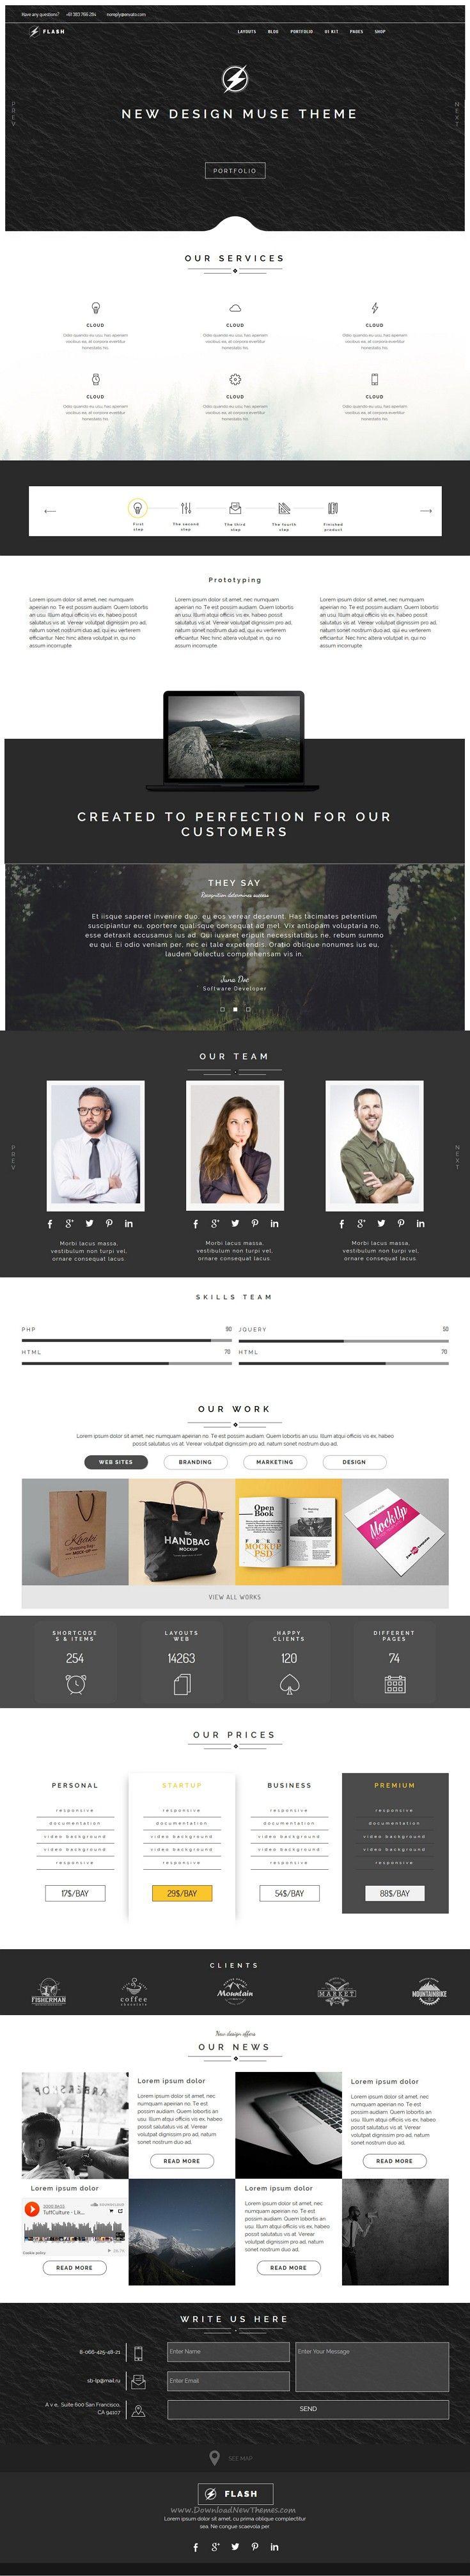 27 best Web design templates ADOBE MUSE images on Pinterest ...